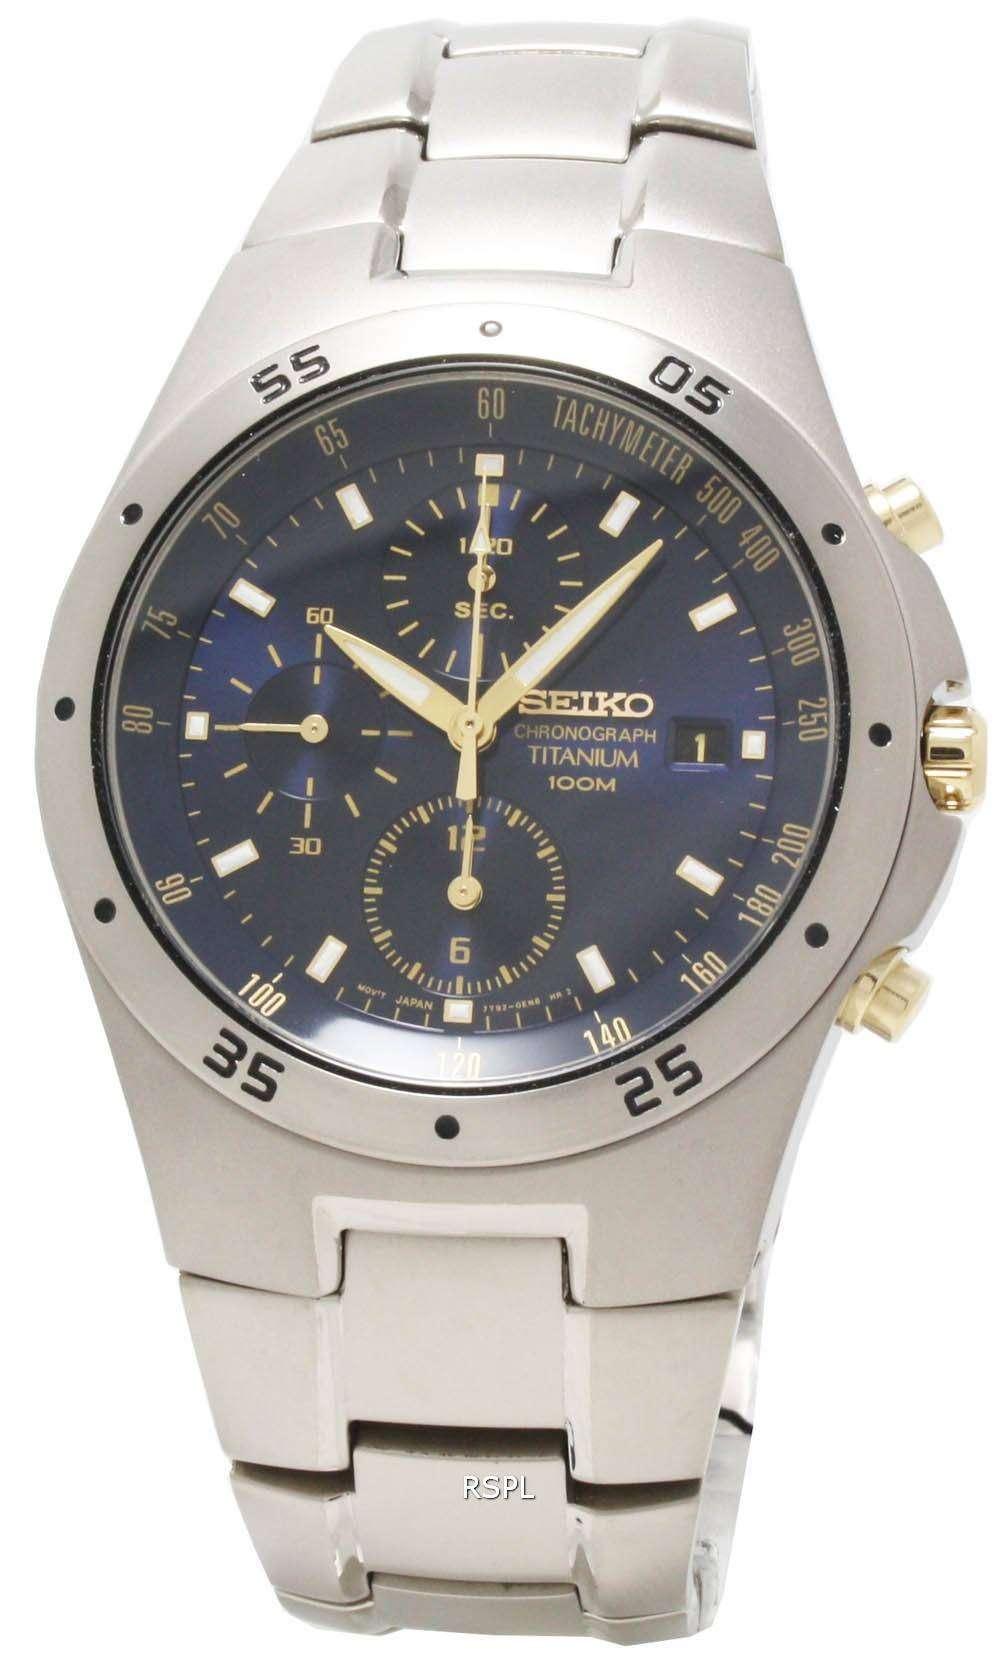 seiko chronograph titanium two tone mens watch snd449p1. Black Bedroom Furniture Sets. Home Design Ideas